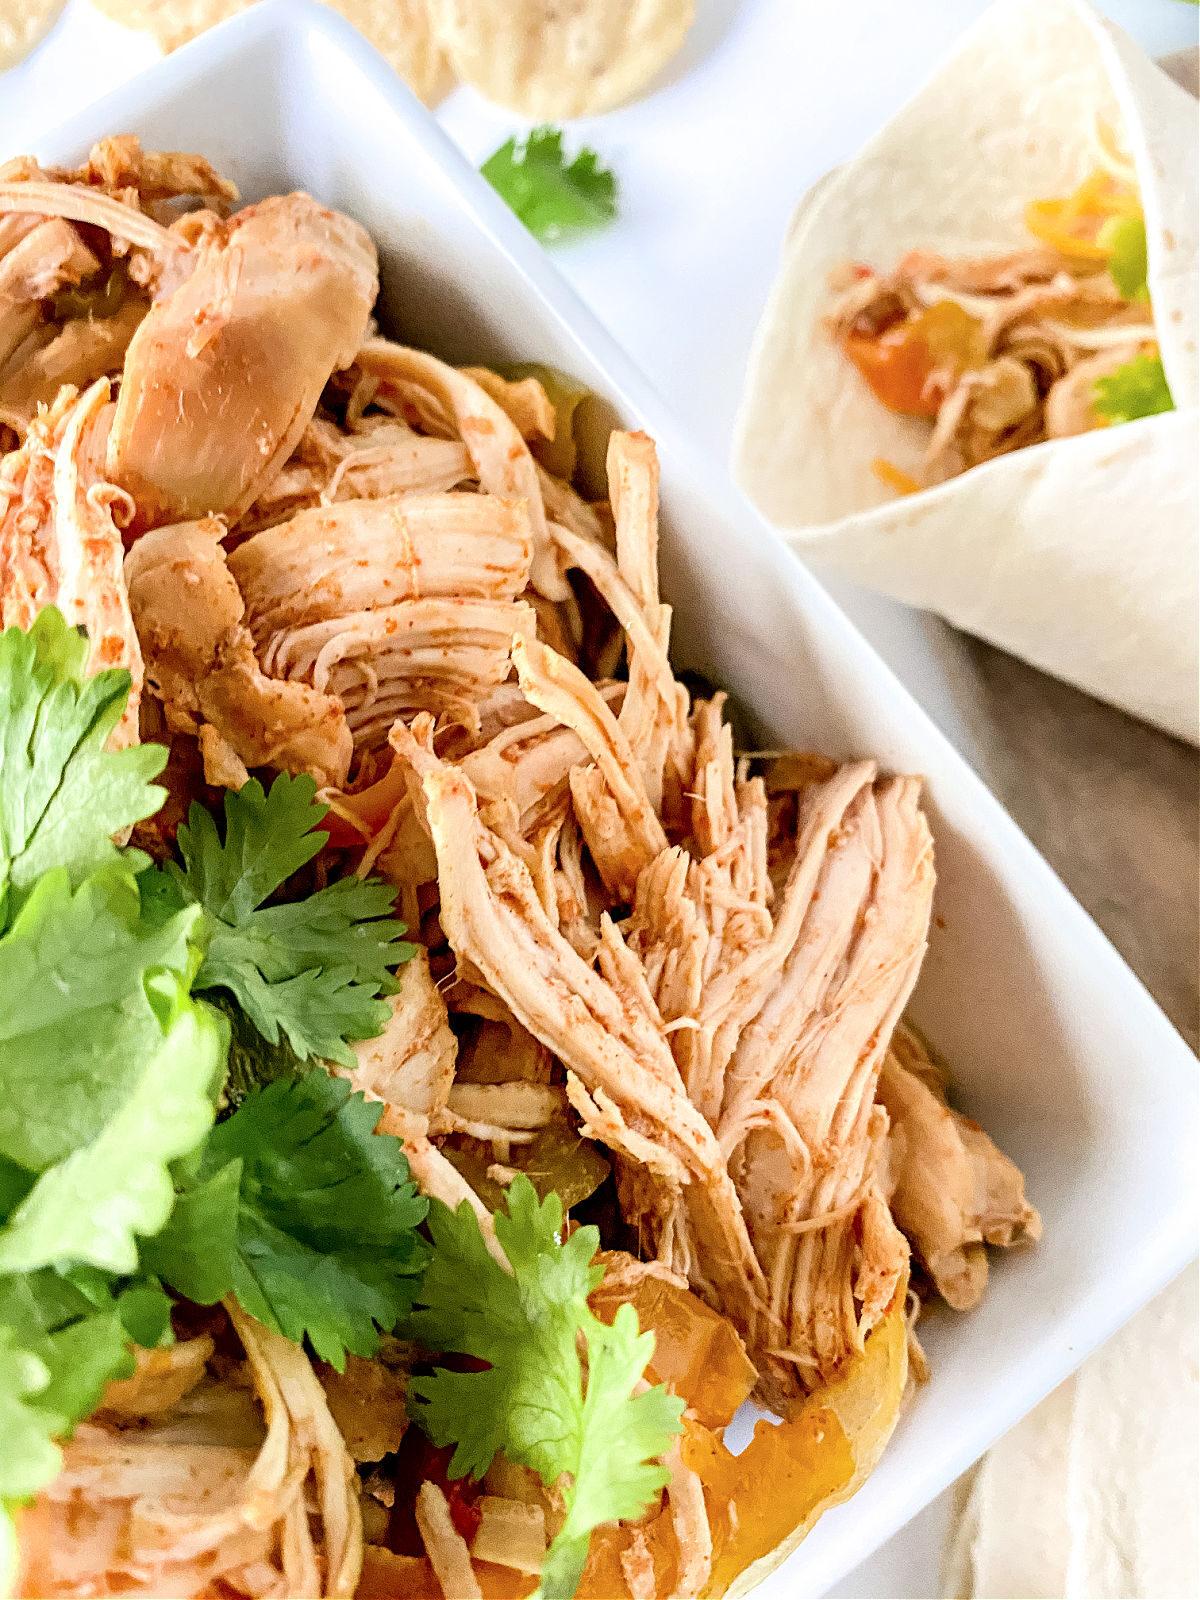 Bowl of chicken fajita meat and wrapped chicken fajita.